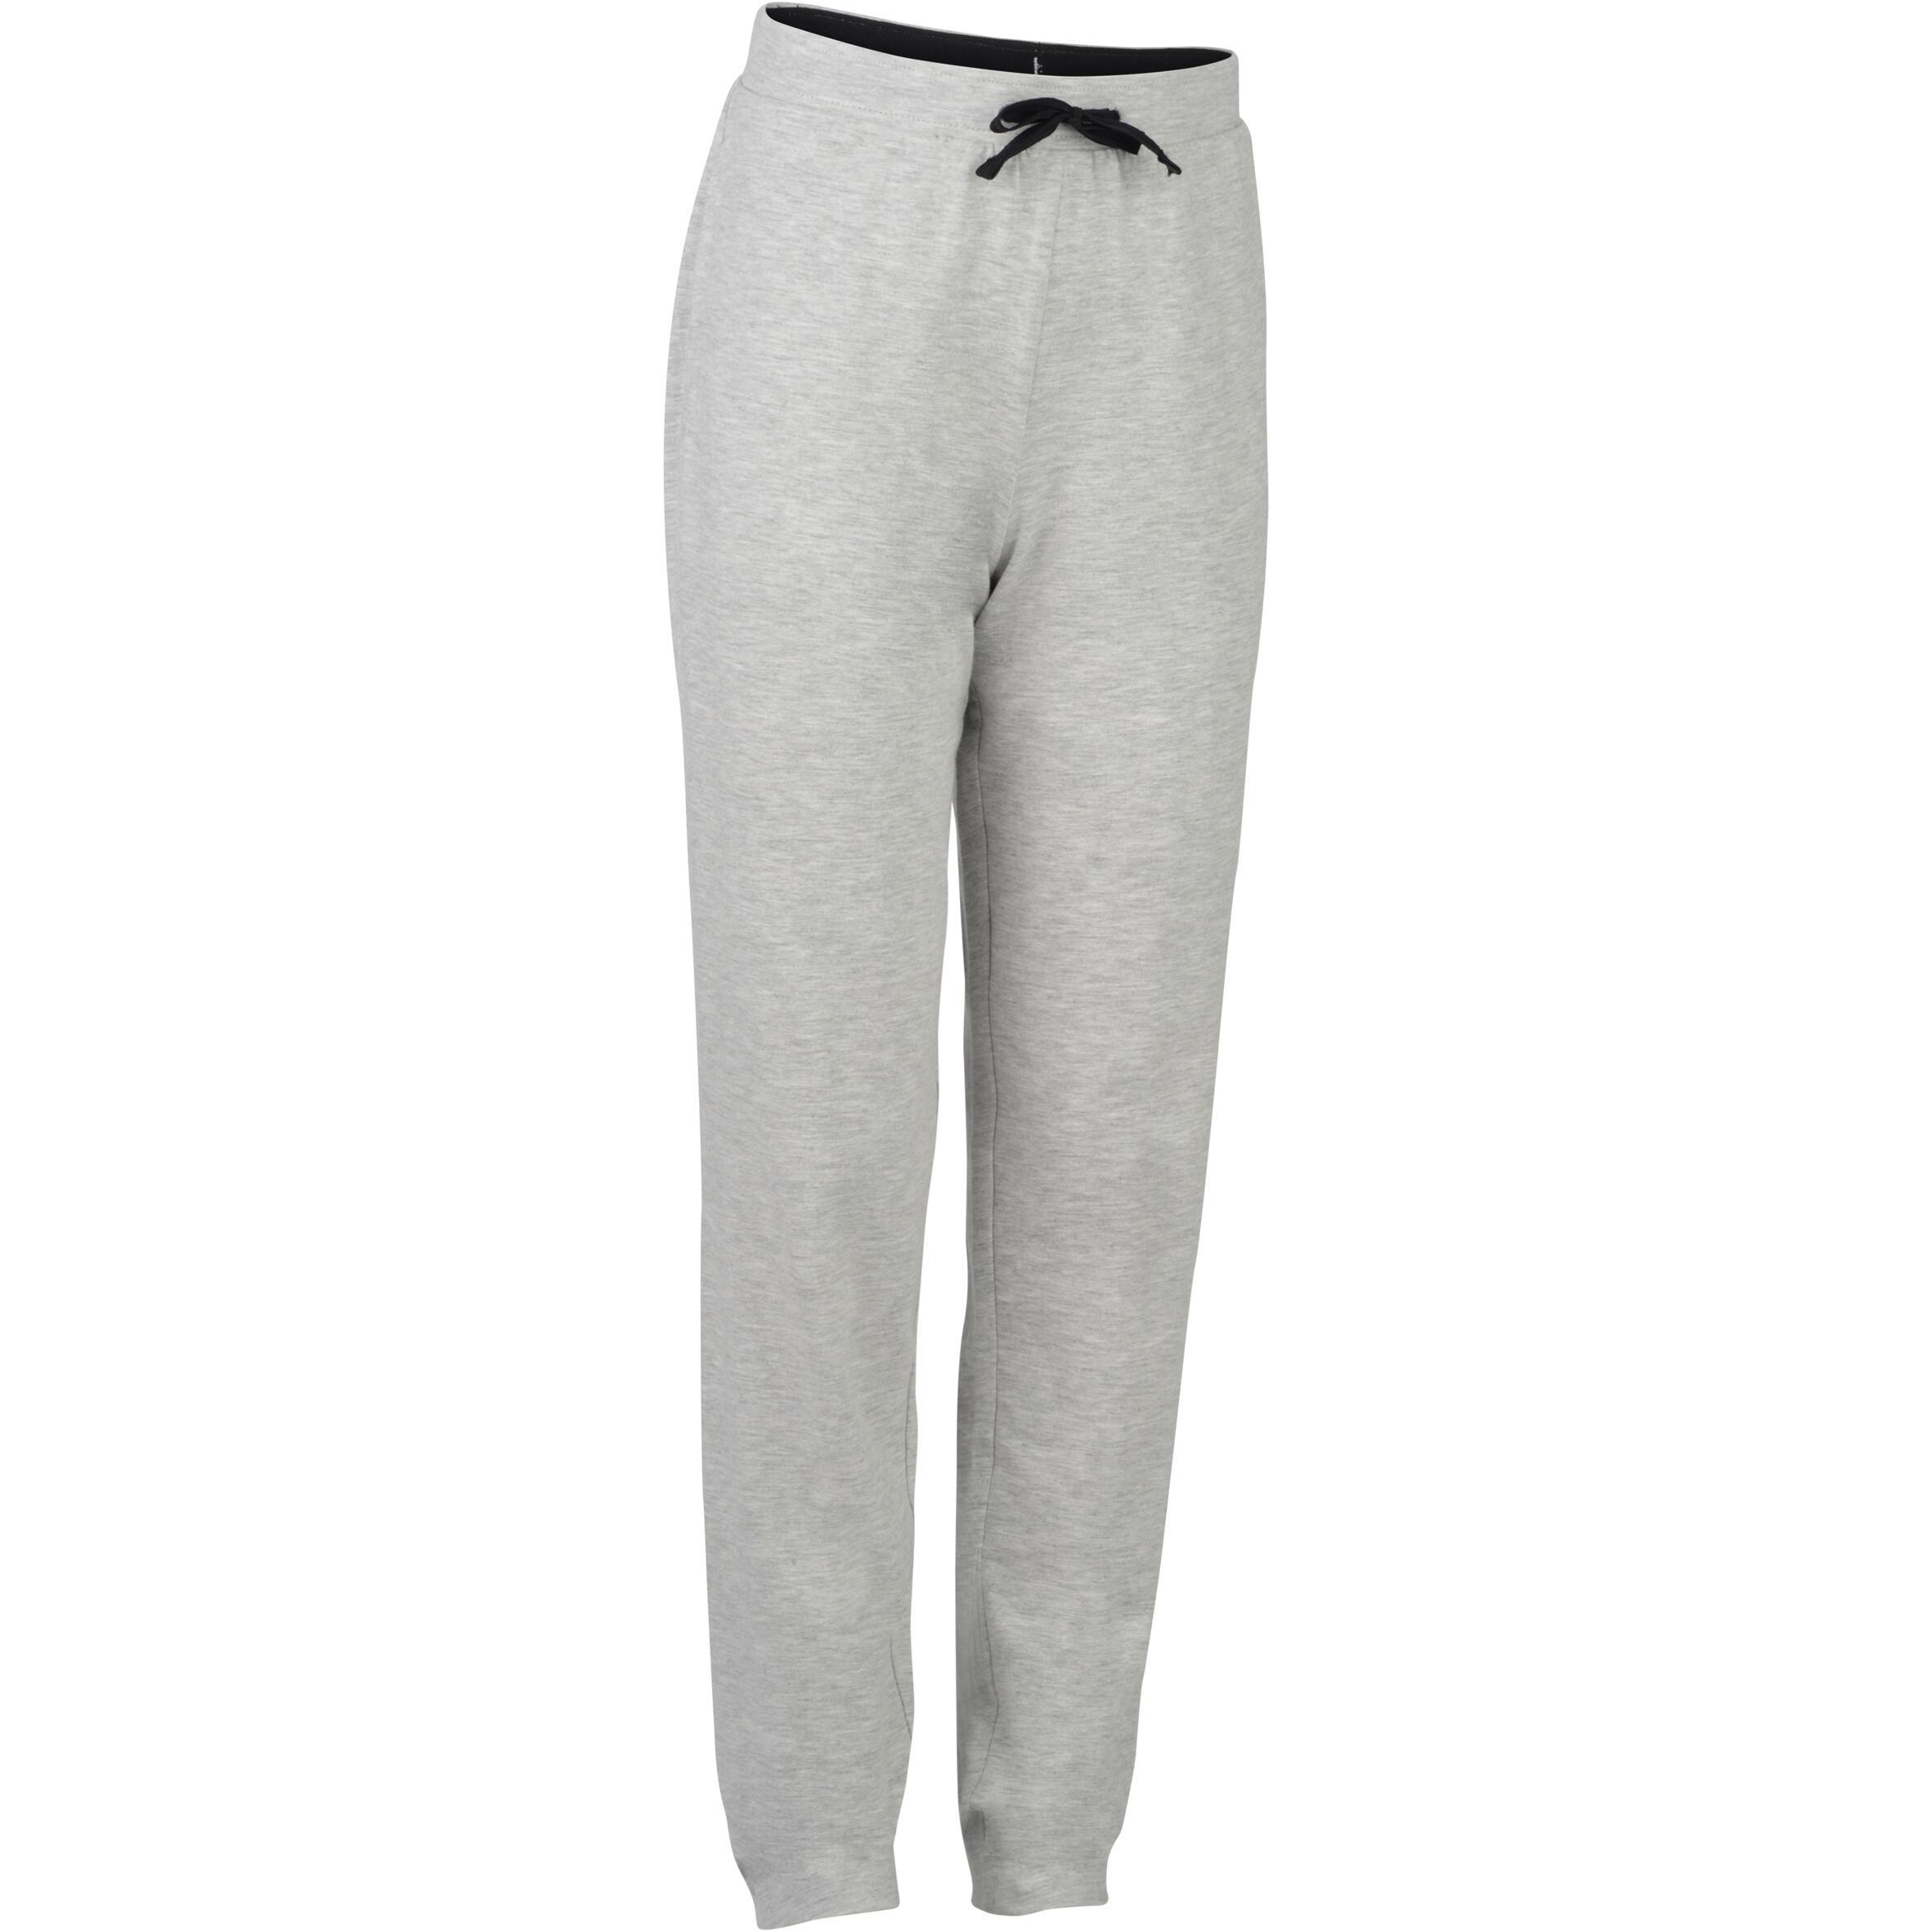 Pantalón algodón transpirable ligero Slim 500 niña GIMNASIA JÚNIOR gris claro